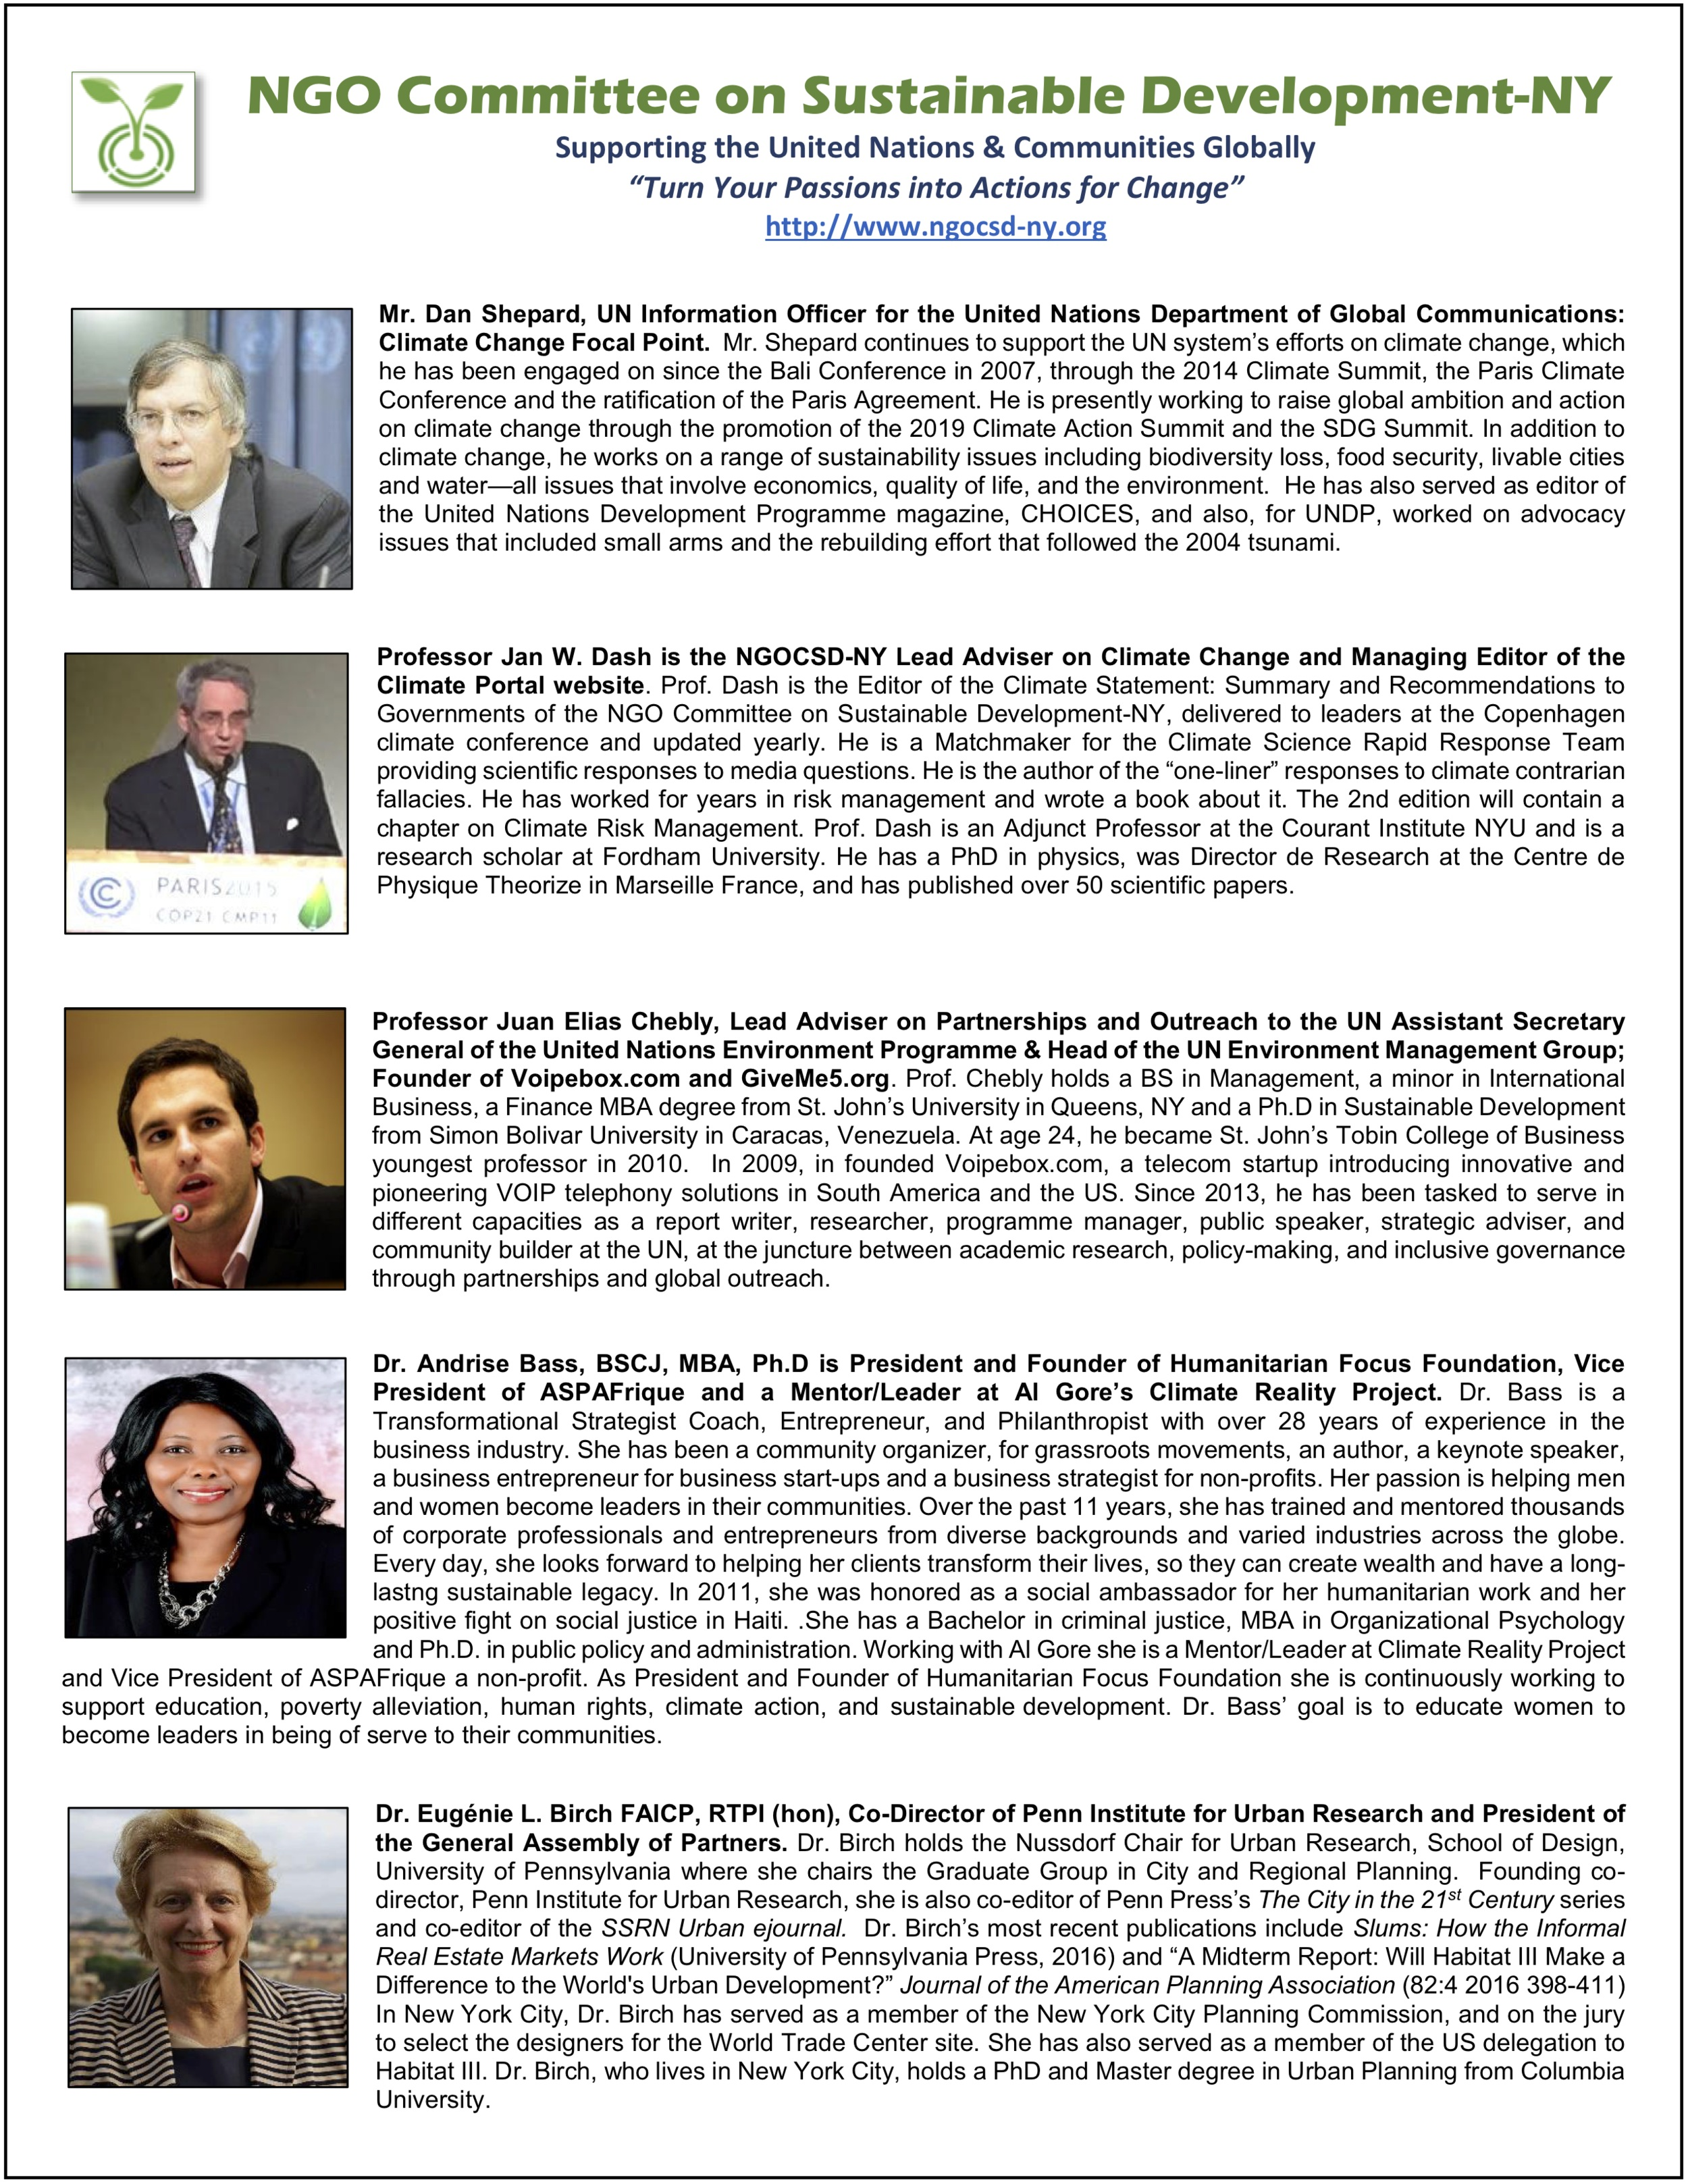 NGOCSD-NY+1-31-19+Climate+Action+2019+%26+Beyond+Photo-Bios+B4a.jpg